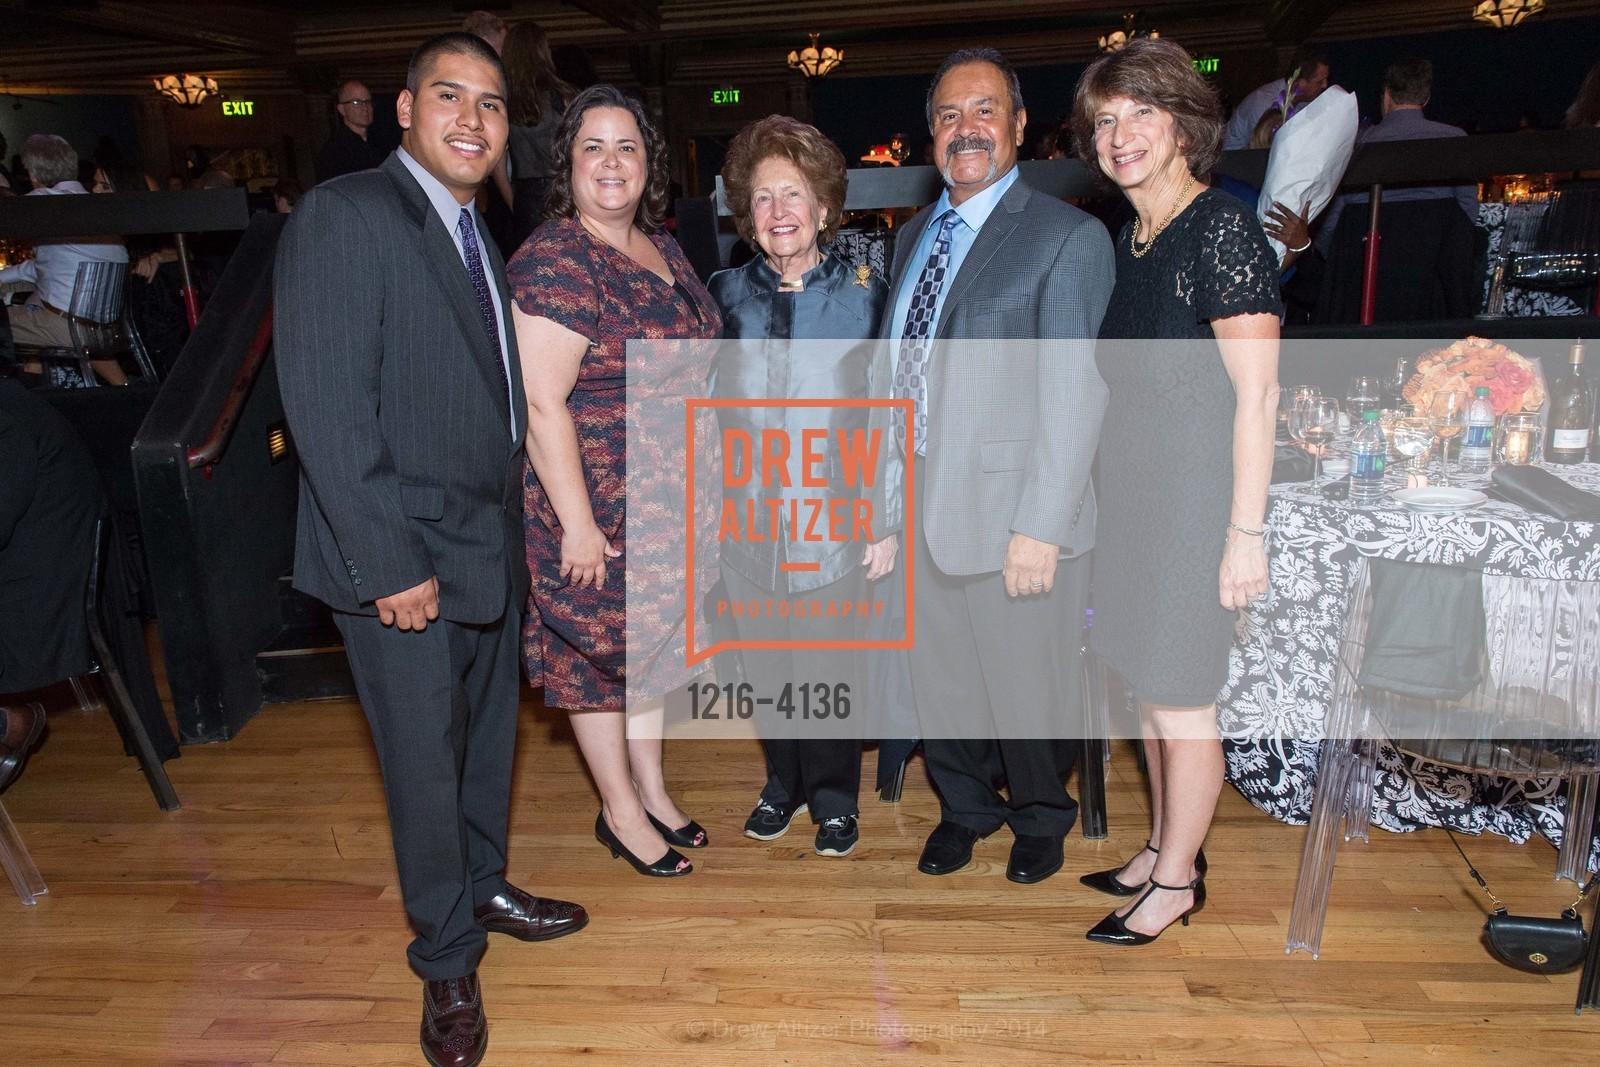 Juan Tello, Shawn Smith, Phyllis Moldaw, John Raya, Carla Javits, Photo #1216-4136